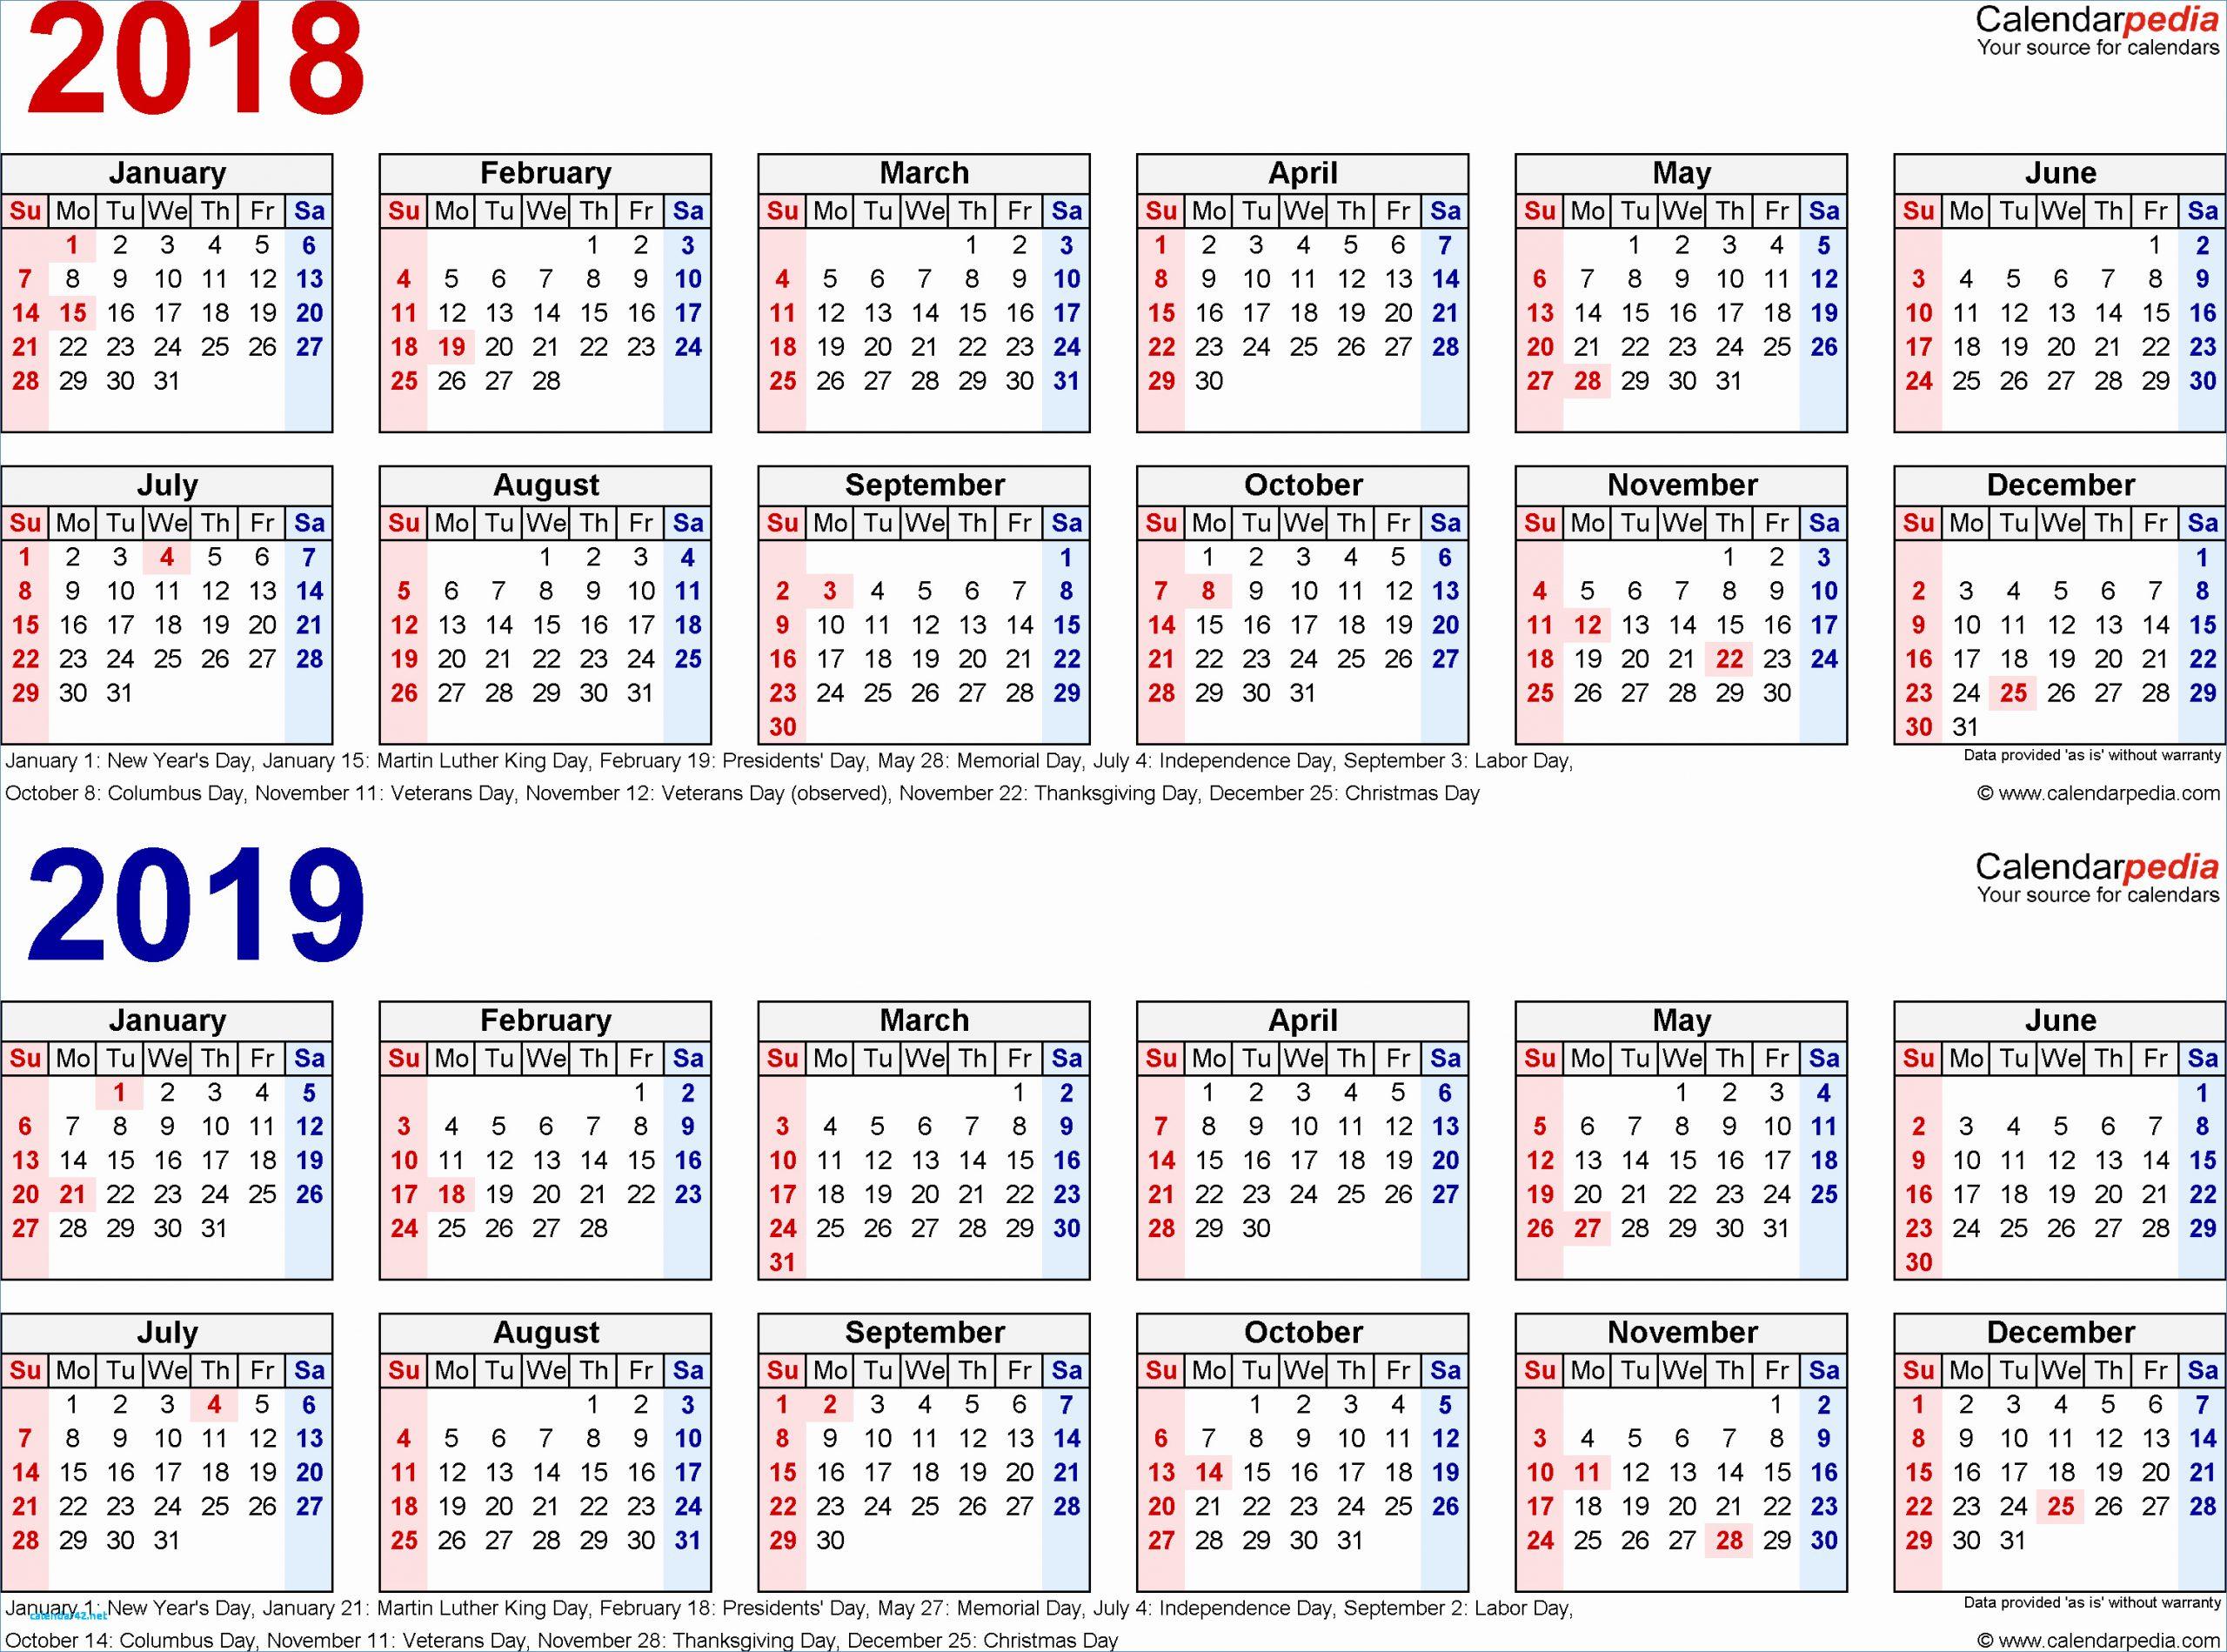 Raytheon Holiday Calender | Payroll Calendars